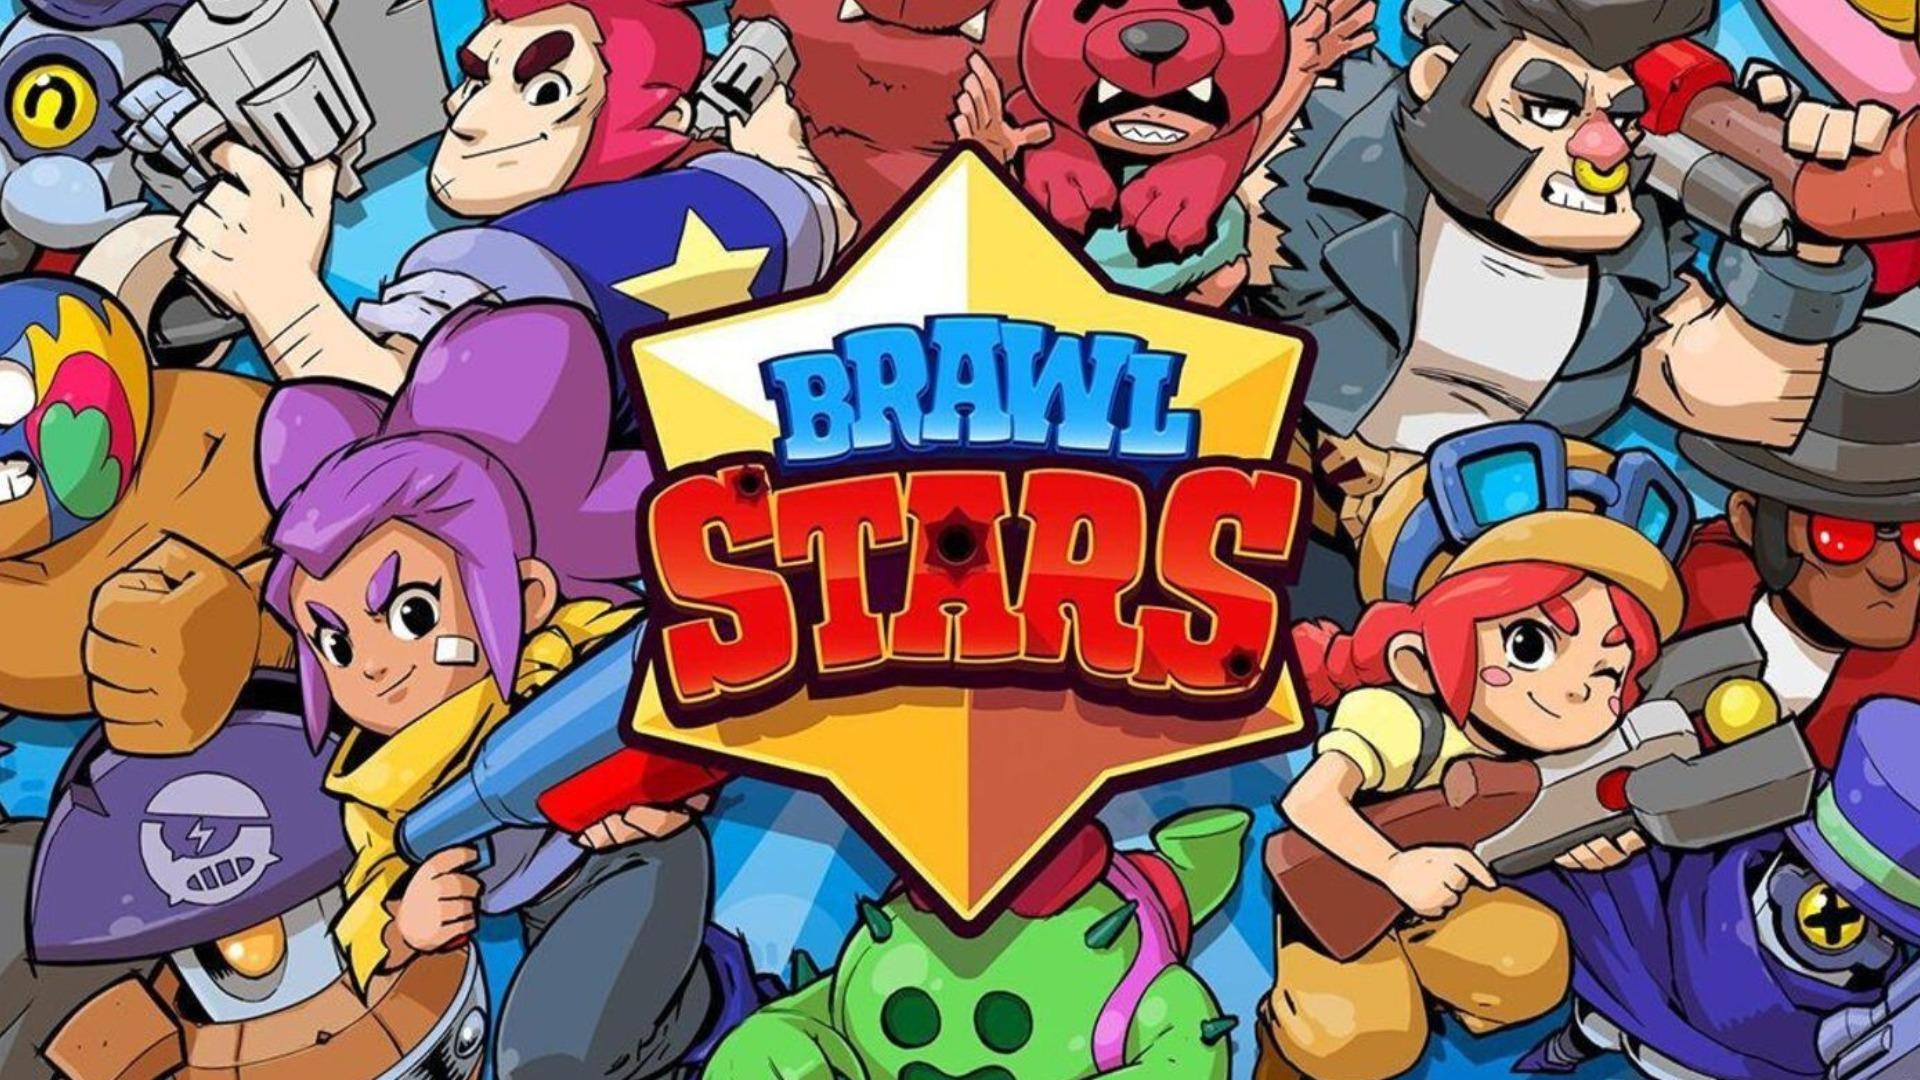 2020 Brawl Stars Free Gems Brawl Stars Hack 2020 No Human Verification Tickets By Brawl Stars Thursday May 21 2020 Online Event